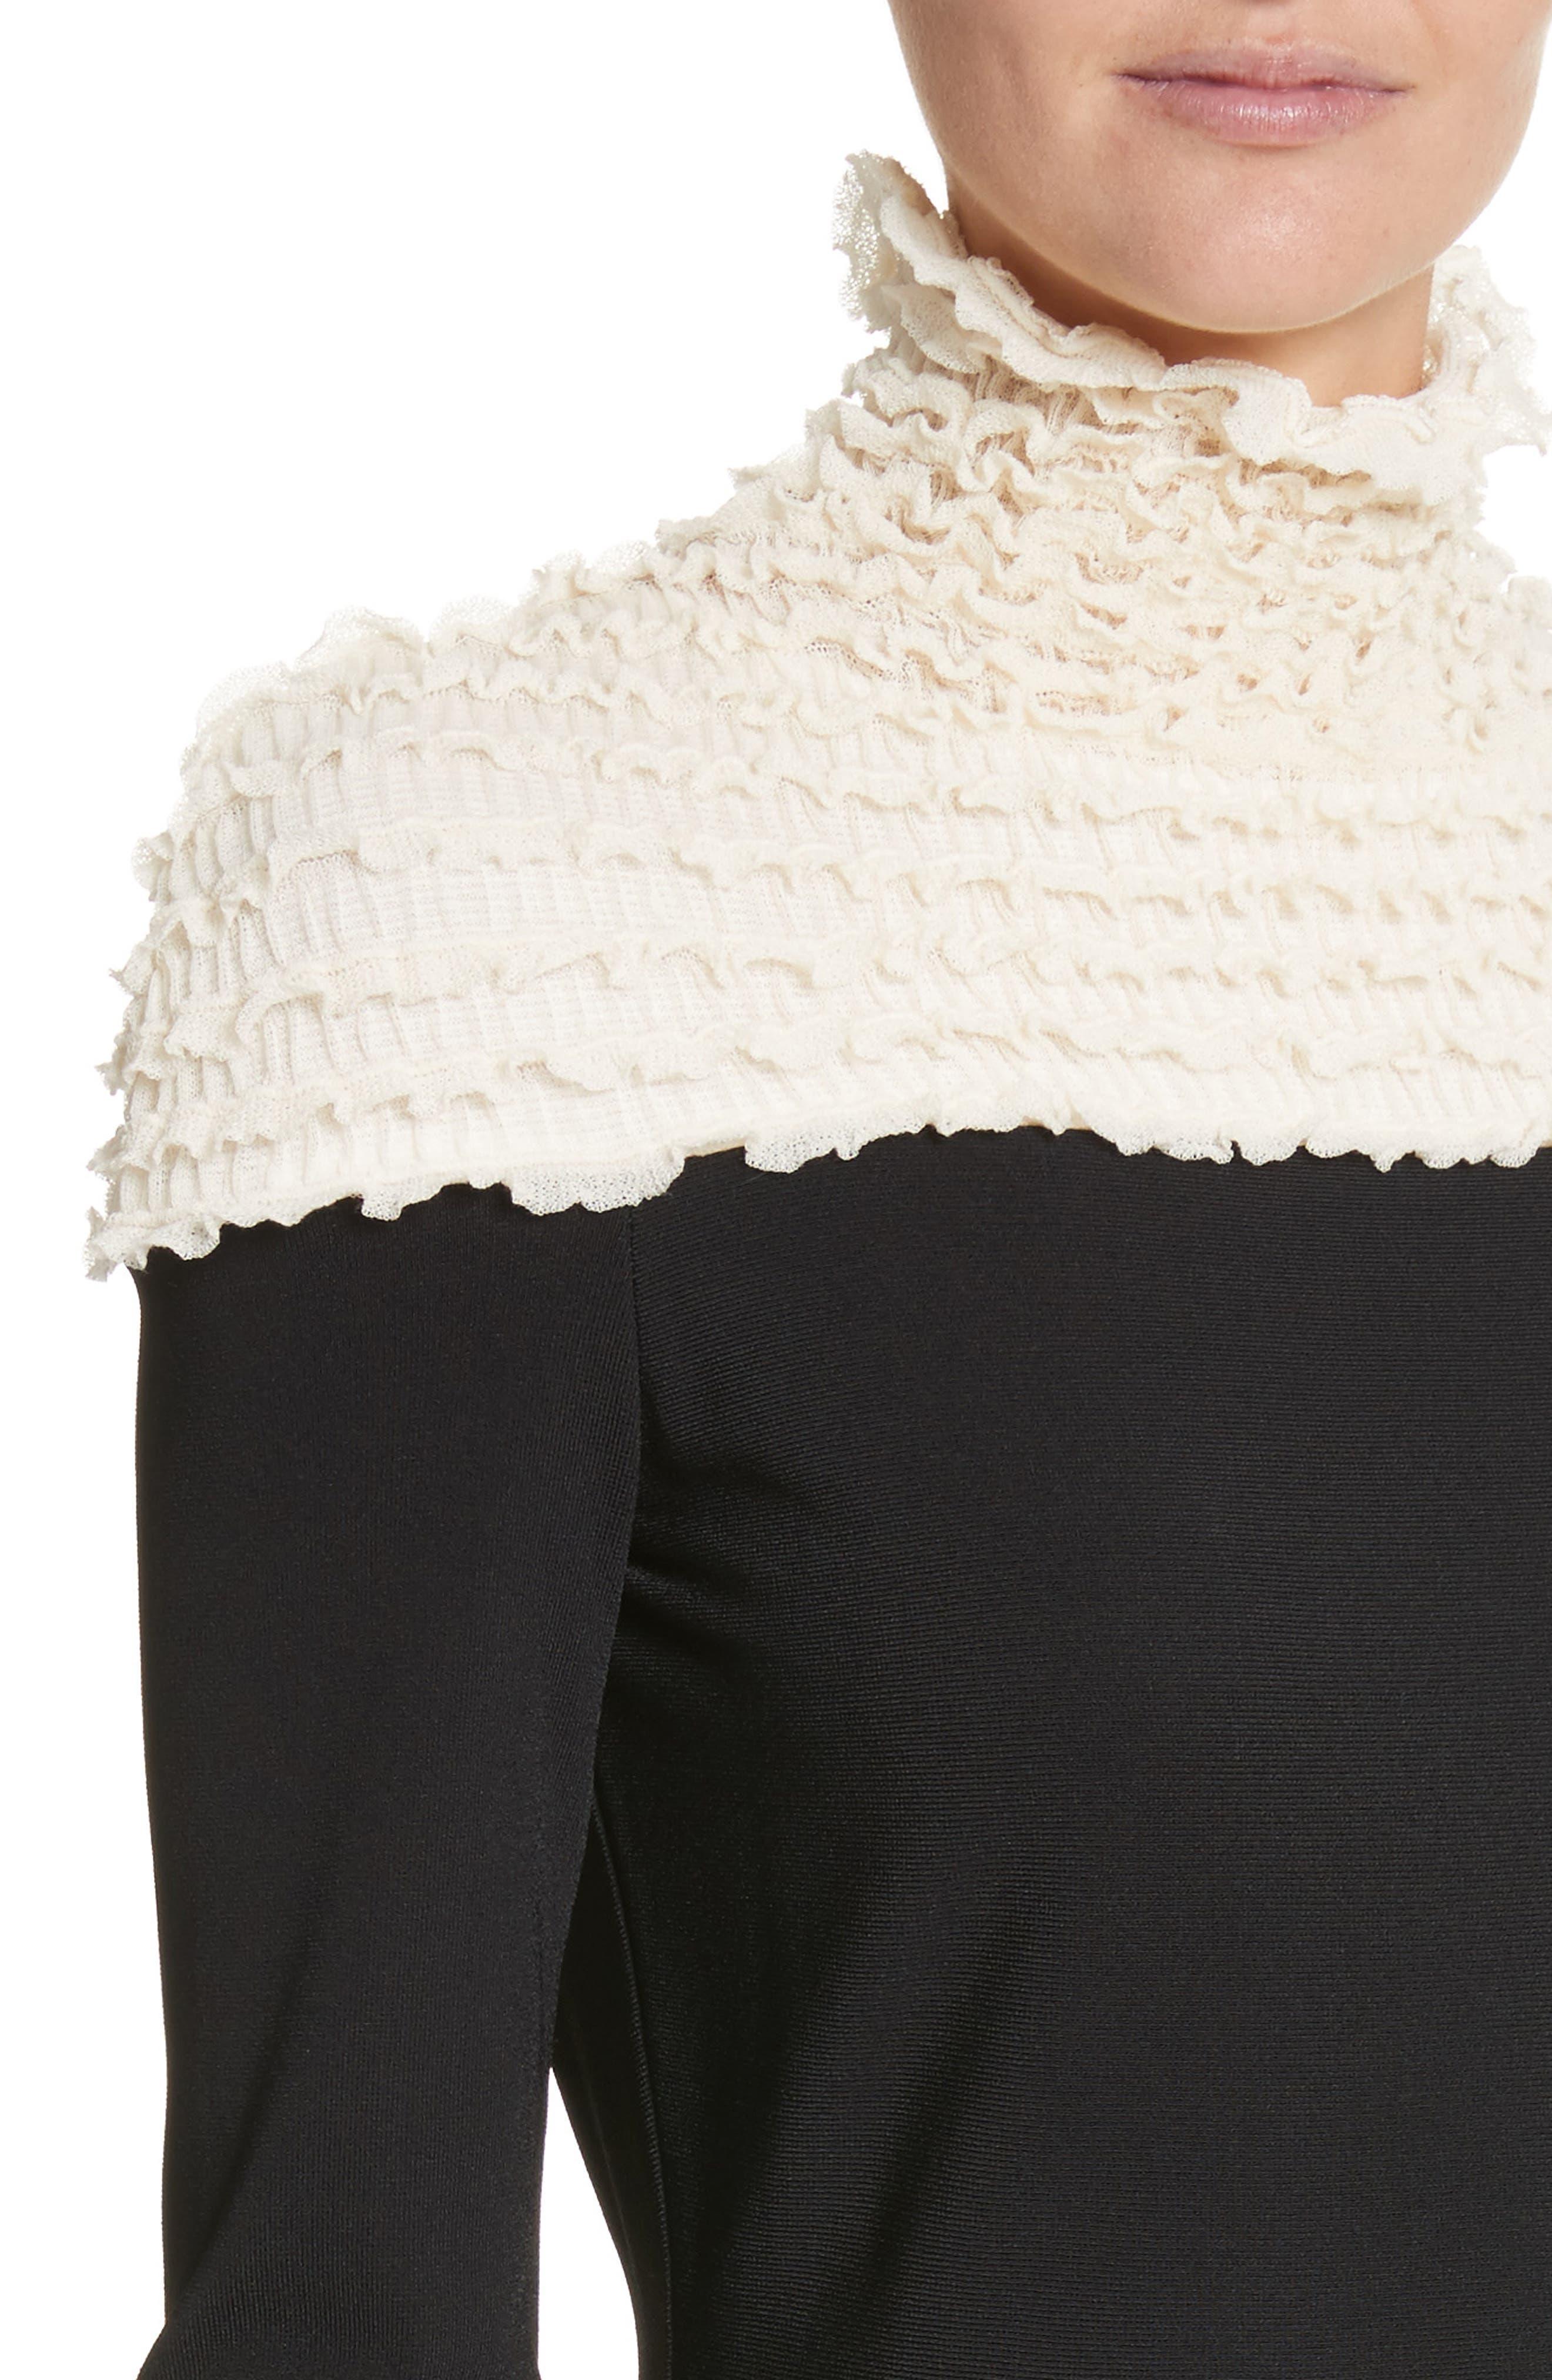 Ruffle Neckline Knit Dress,                             Alternate thumbnail 4, color,                             002